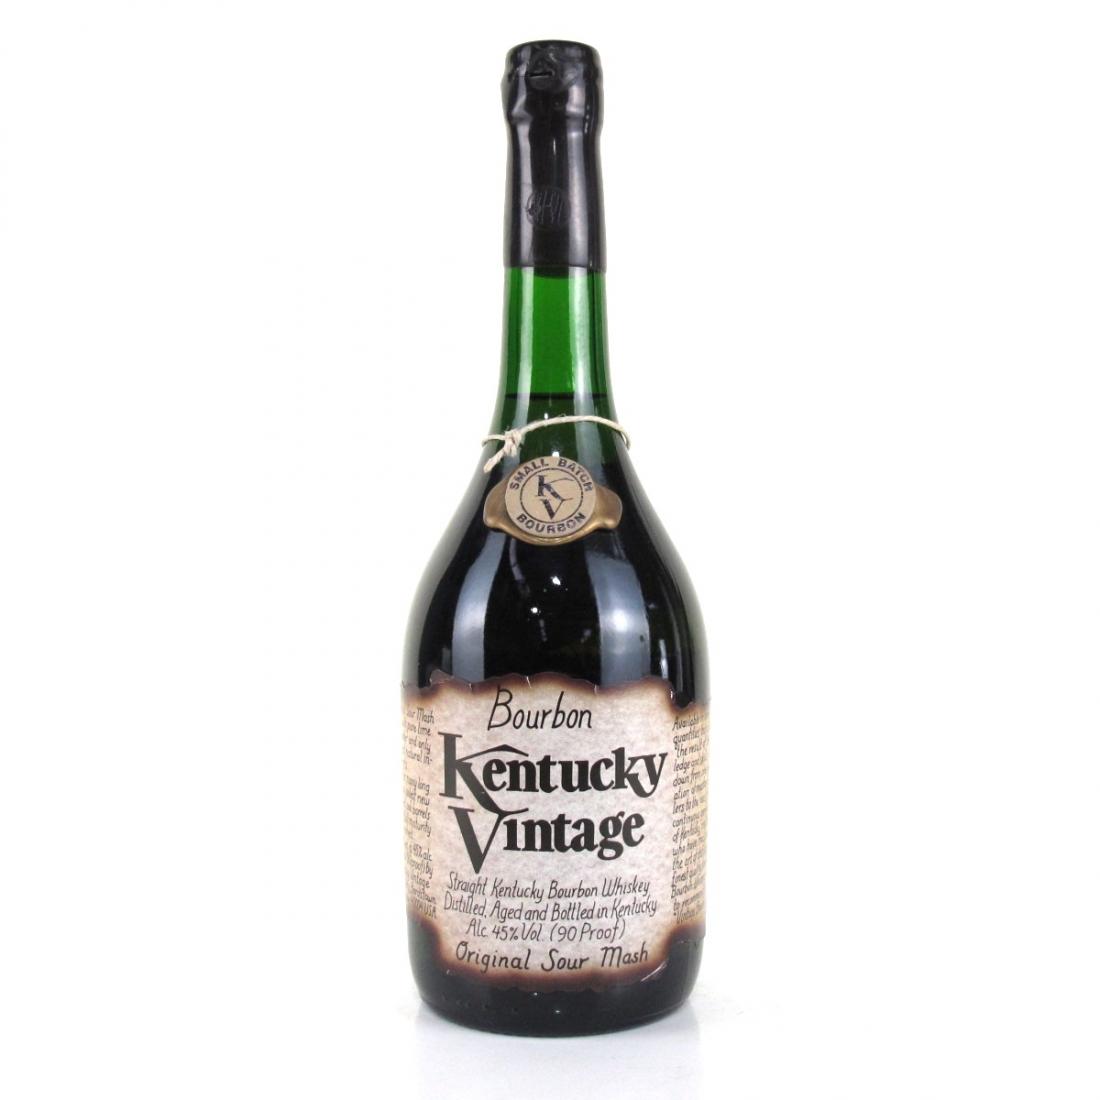 Kentucky Vintage Small Batch Bourbon